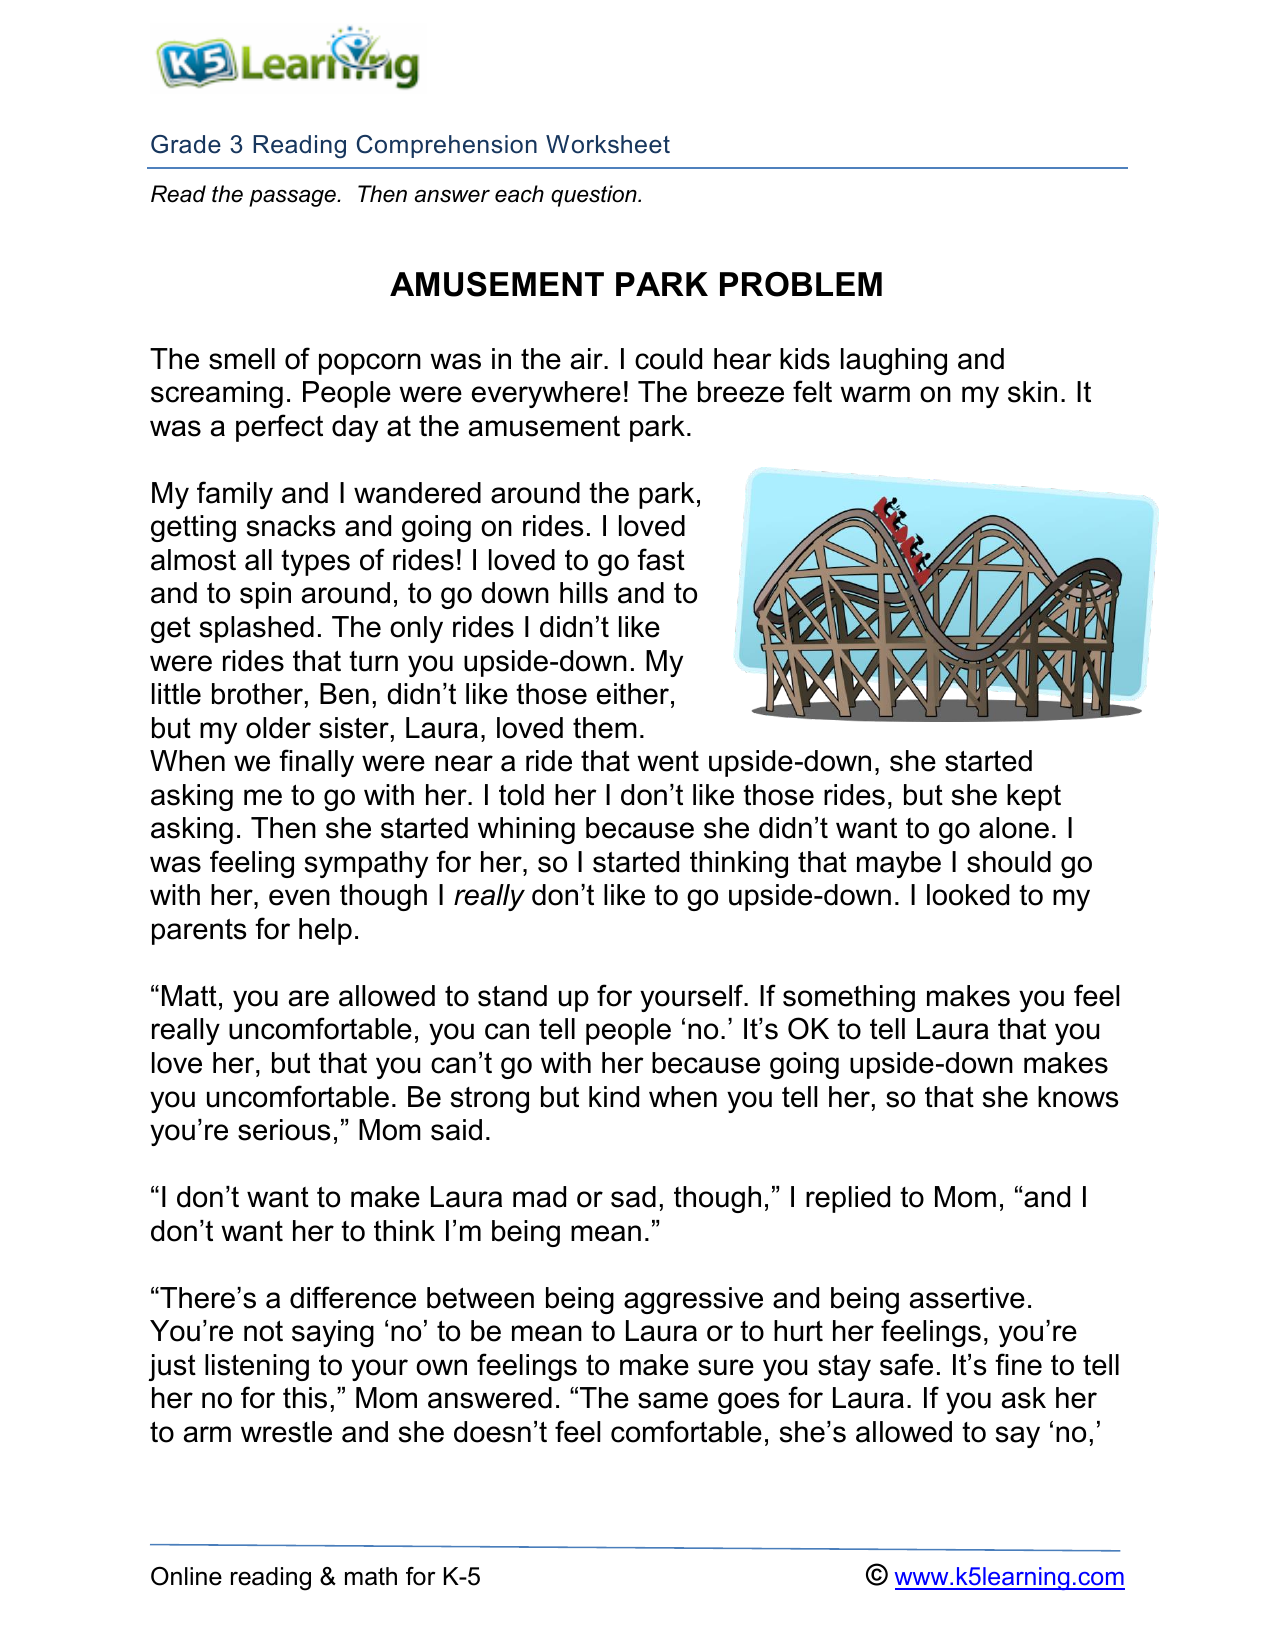 - 3rd-grade-reading Comprehension-amusement-park